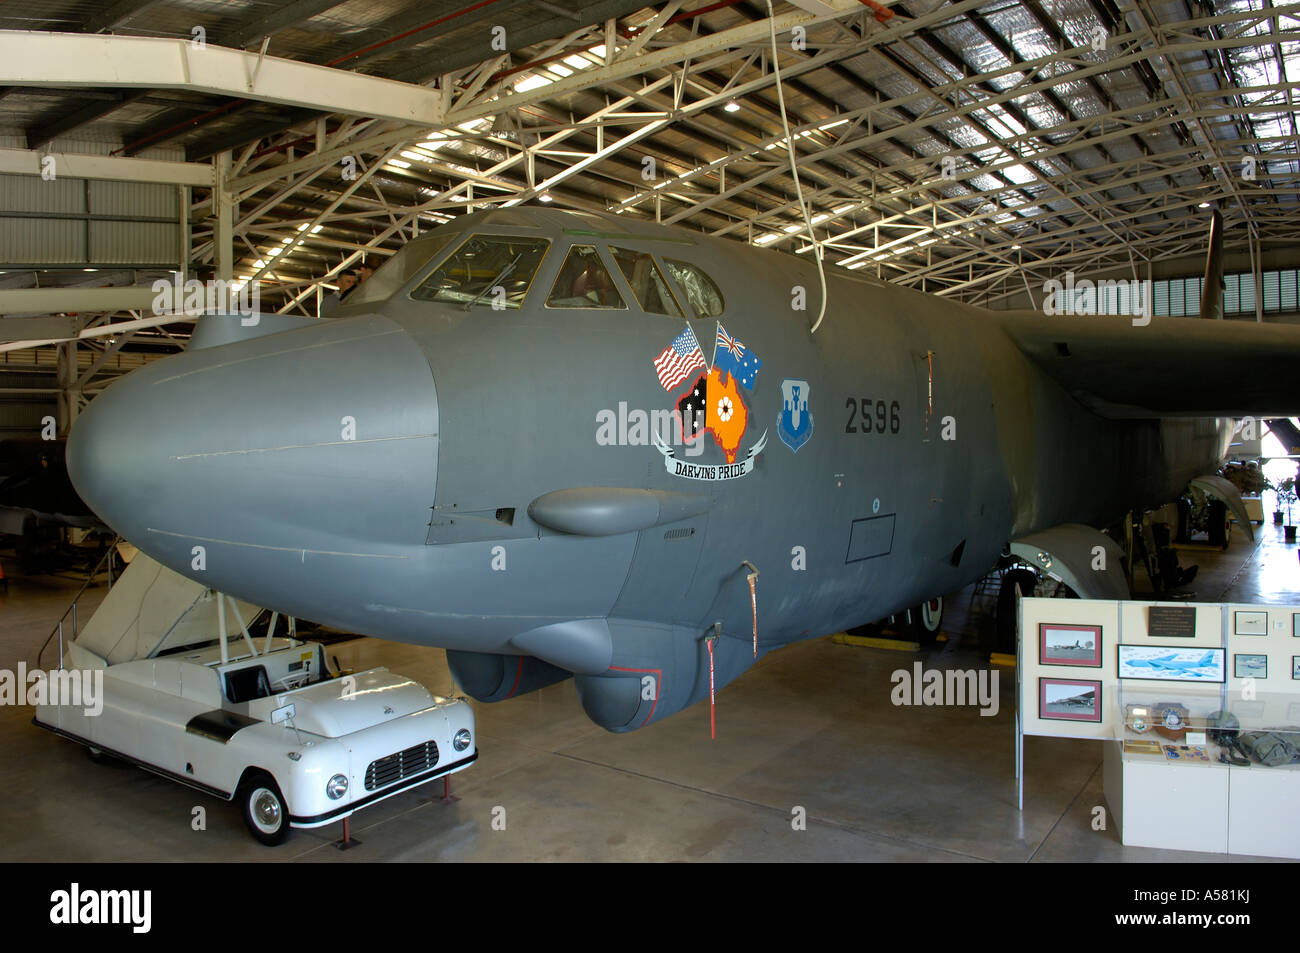 B 52 aircraft of word war 2, shown in darwin, australia - Stock Image